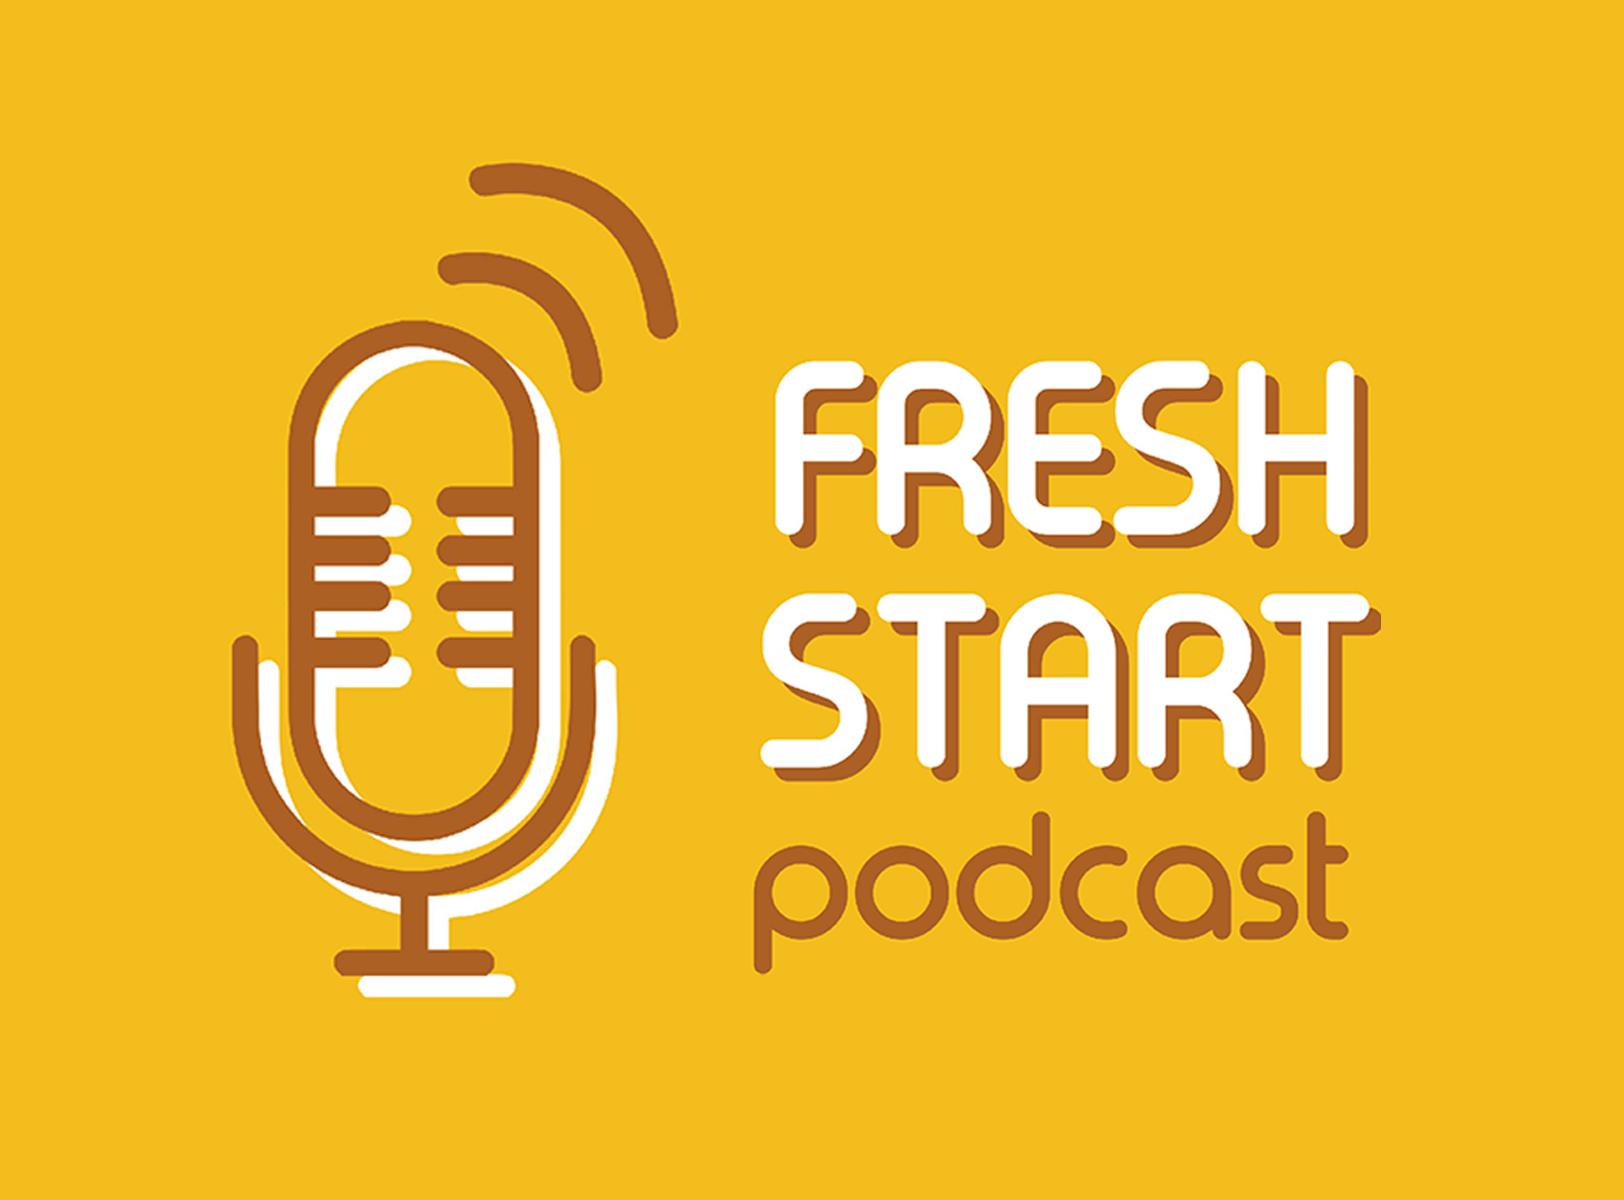 Fresh Start: Podcast News (11/6/2018 Tue.)